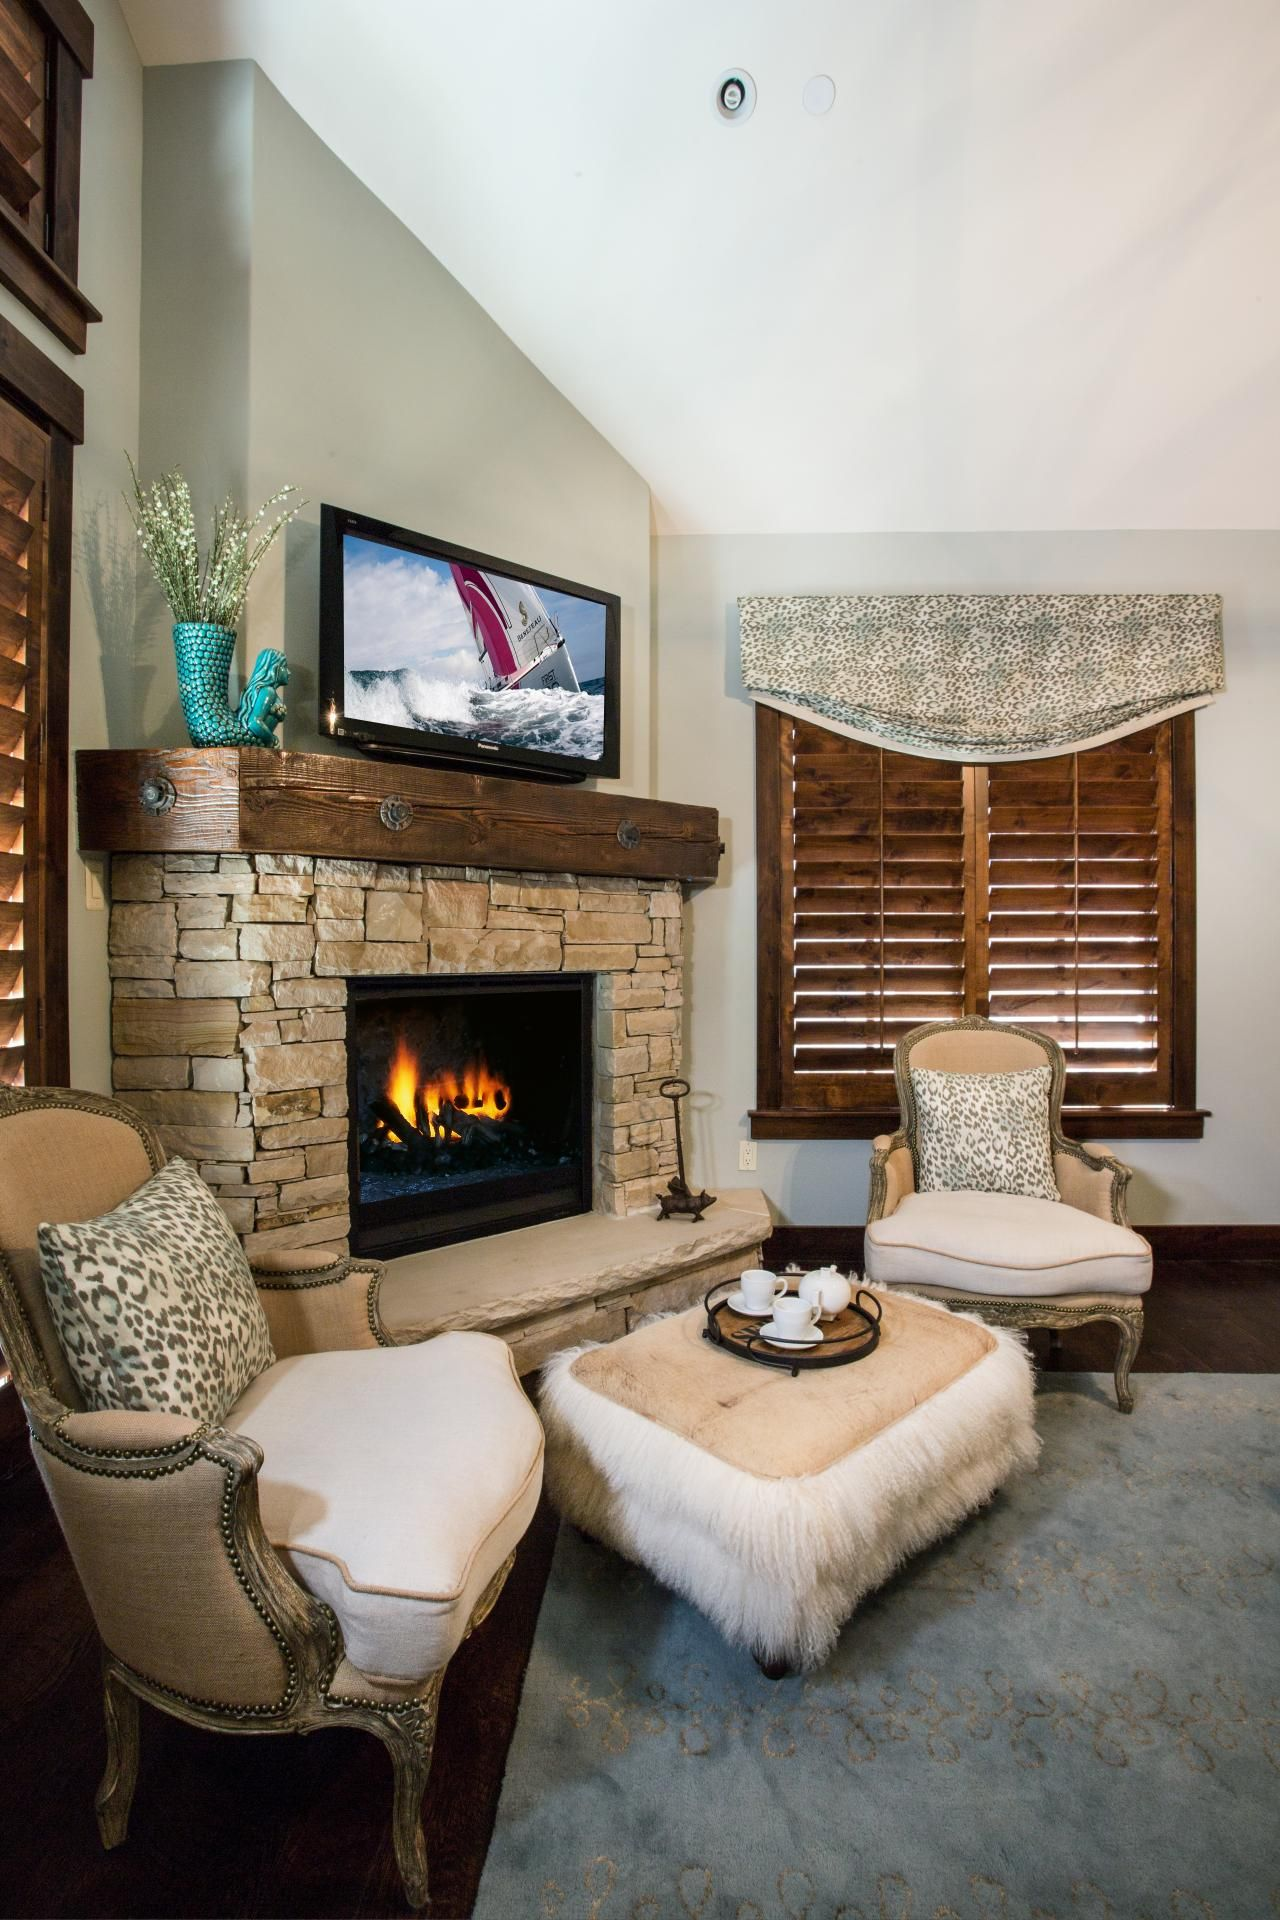 Half Wall Stone Fireplace Google Search Corner Fireplace Comfy Living Room Decor Fireplace Design